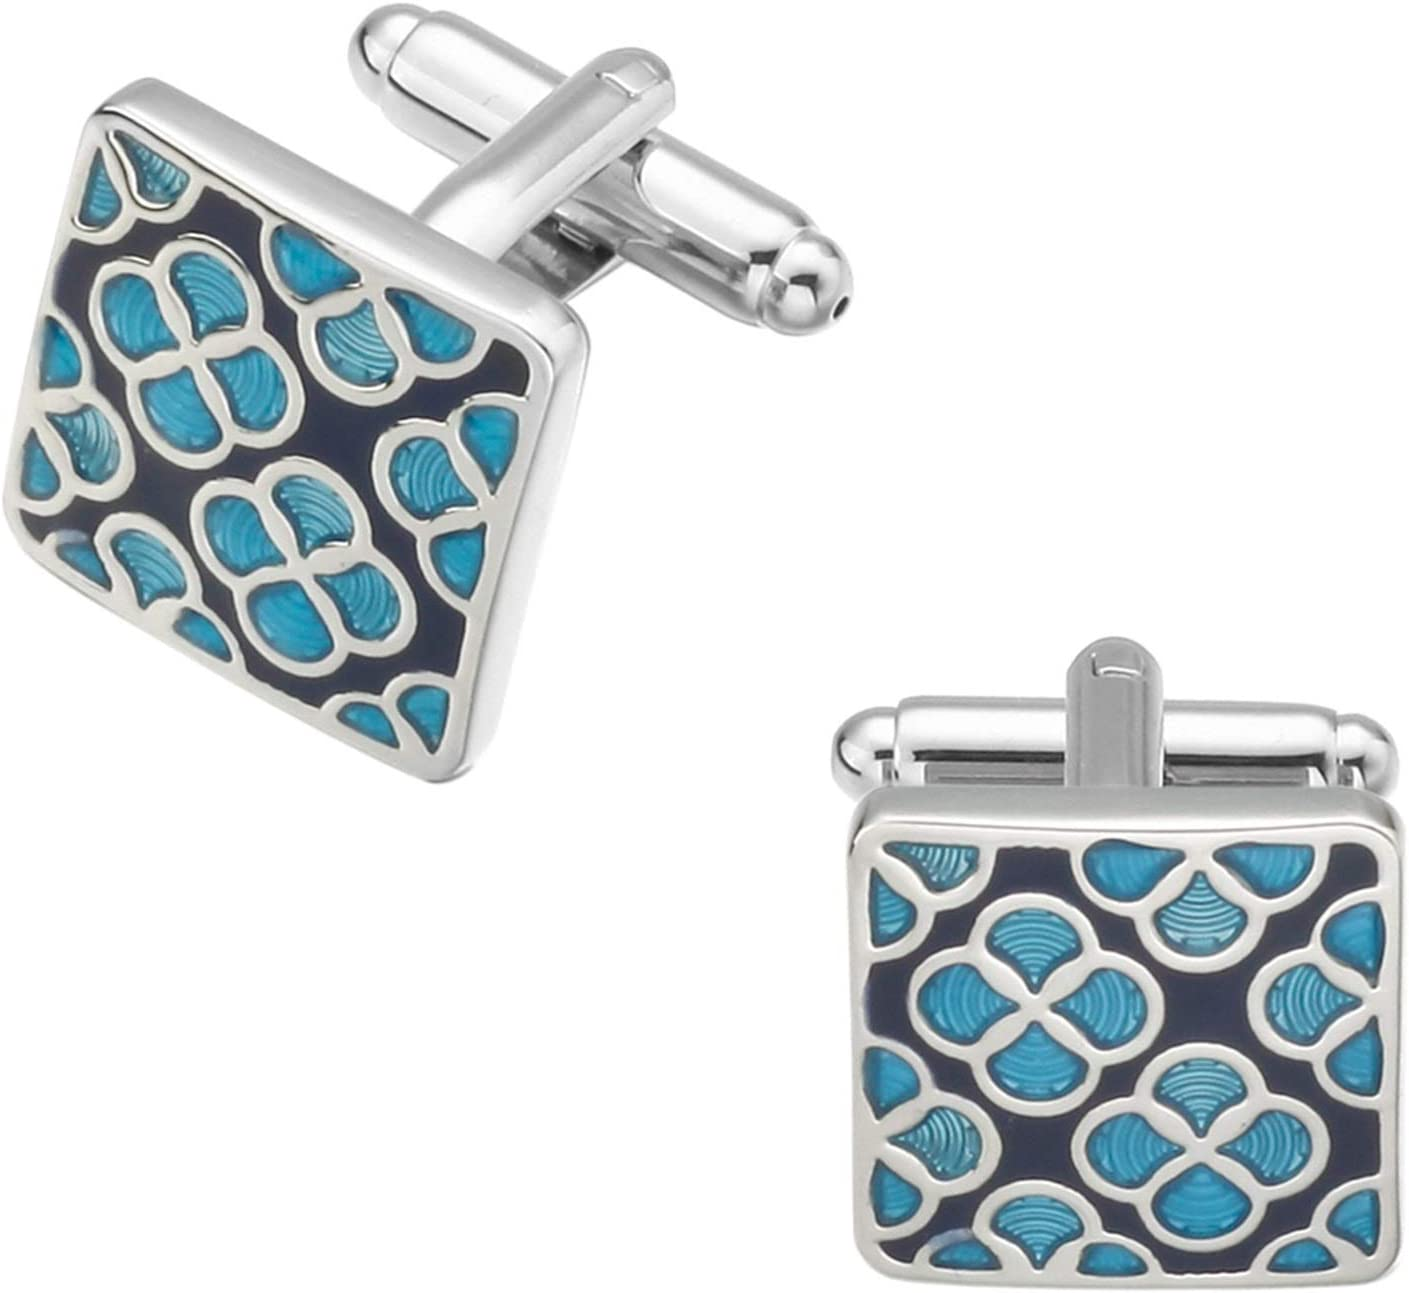 LSDJ QMDSH Vintage Pattern Cufflinks Blue Limited time for free ...